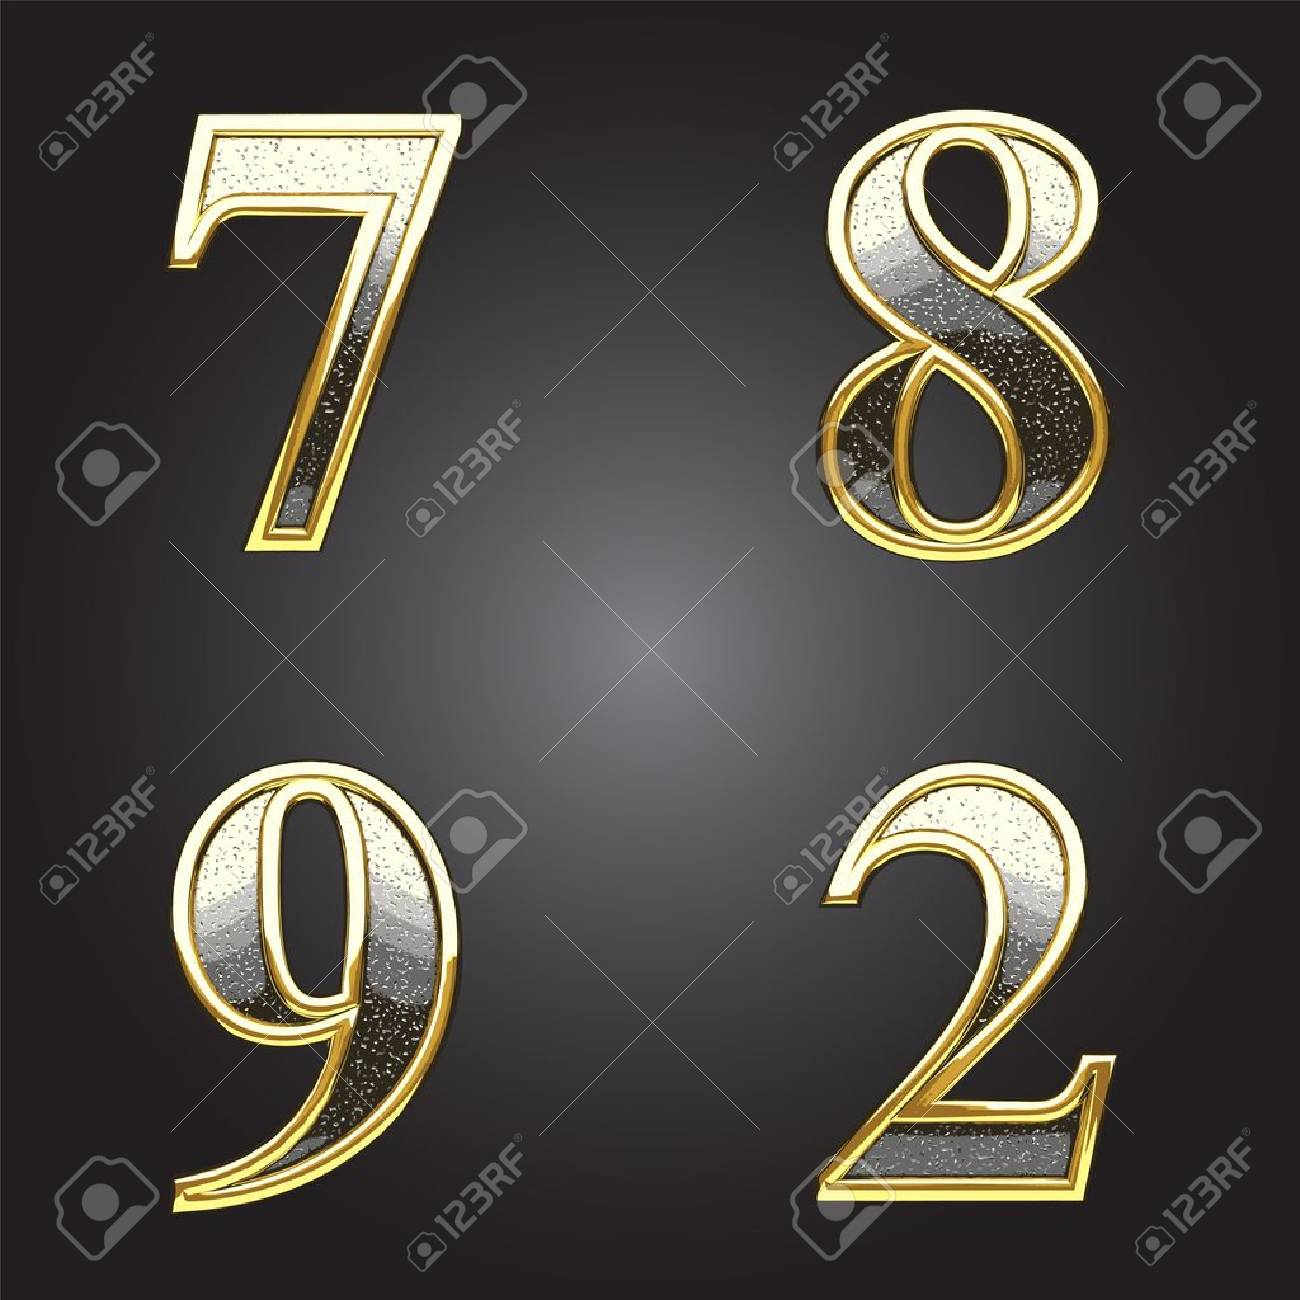 Golden and silver vector figure Stock Vector - 13292165